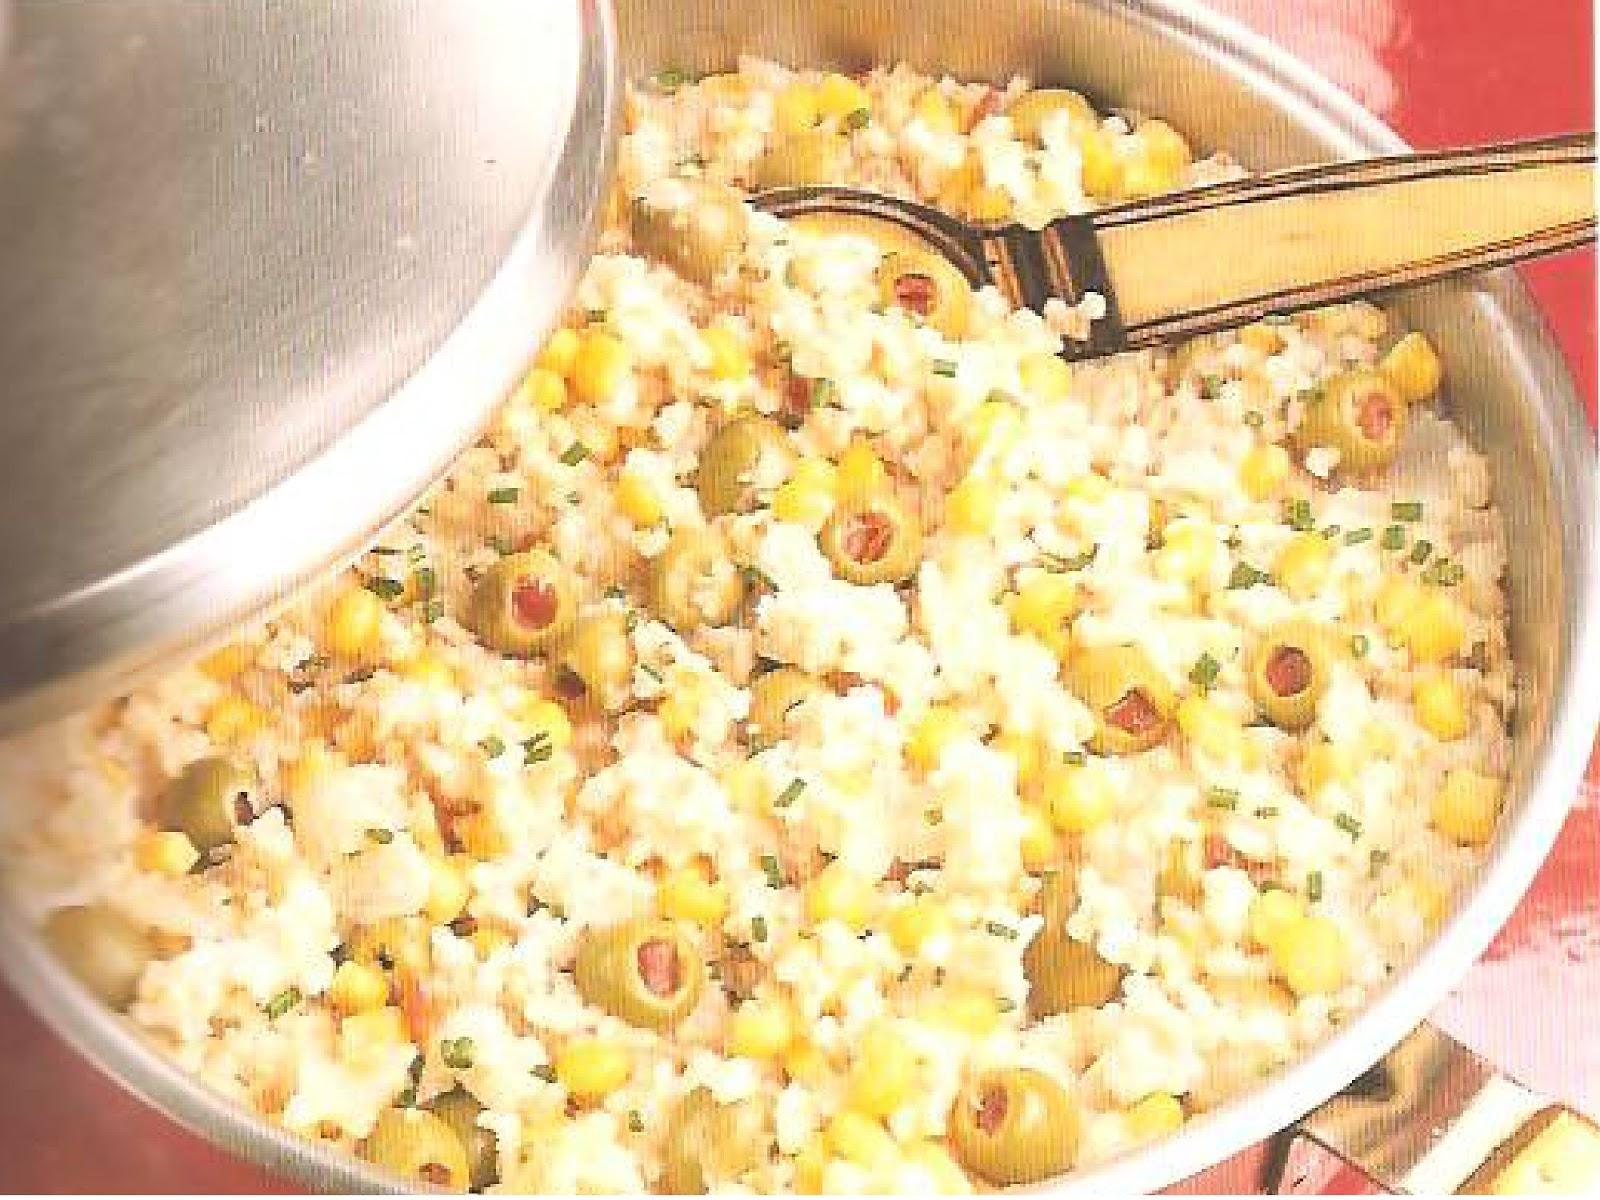 Cocina macrobi tica maiz for Cocina macrobiotica